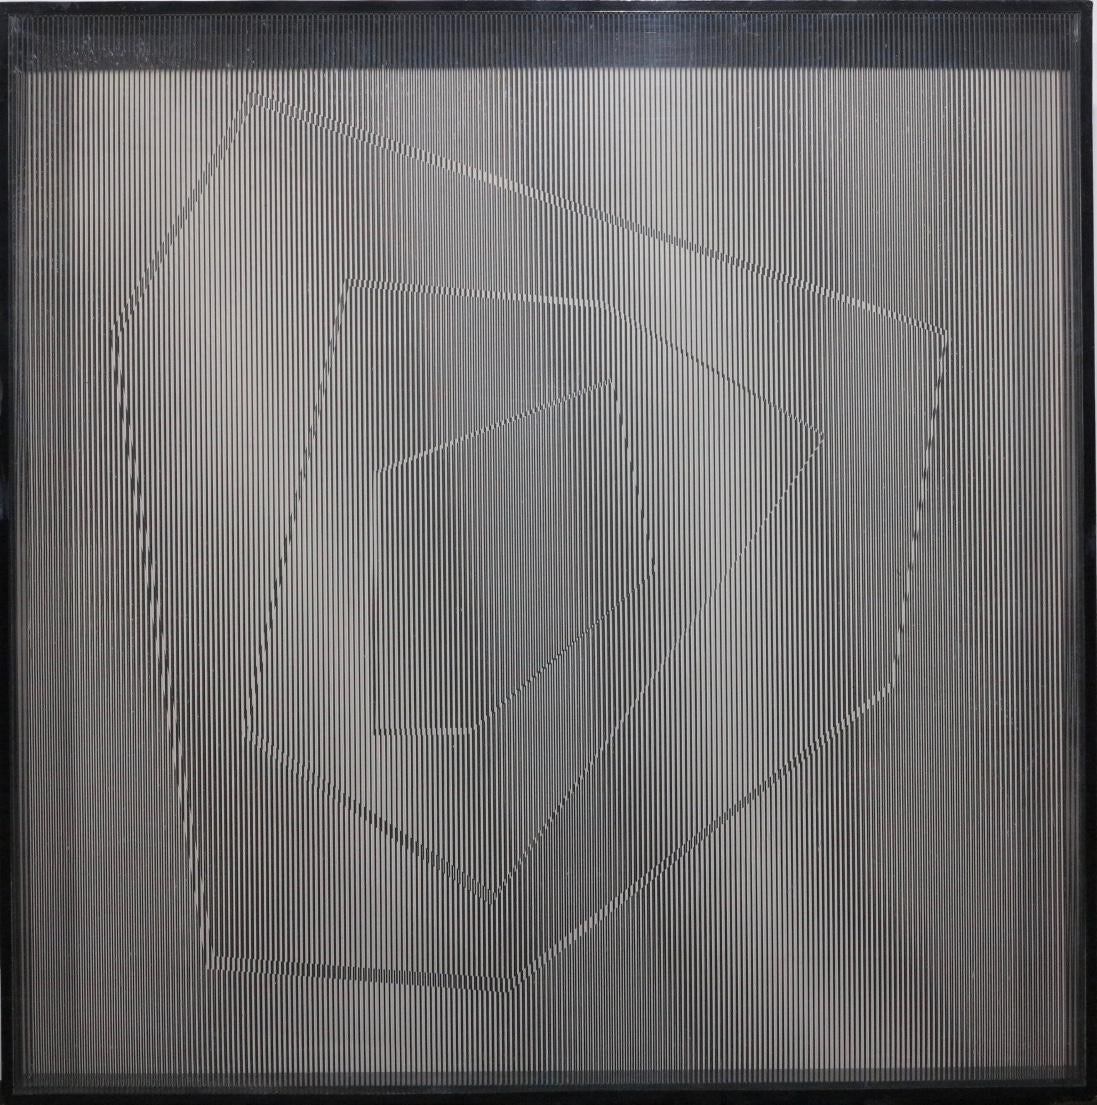 The Edge V (Op Art plexiglass box wall sculpture)